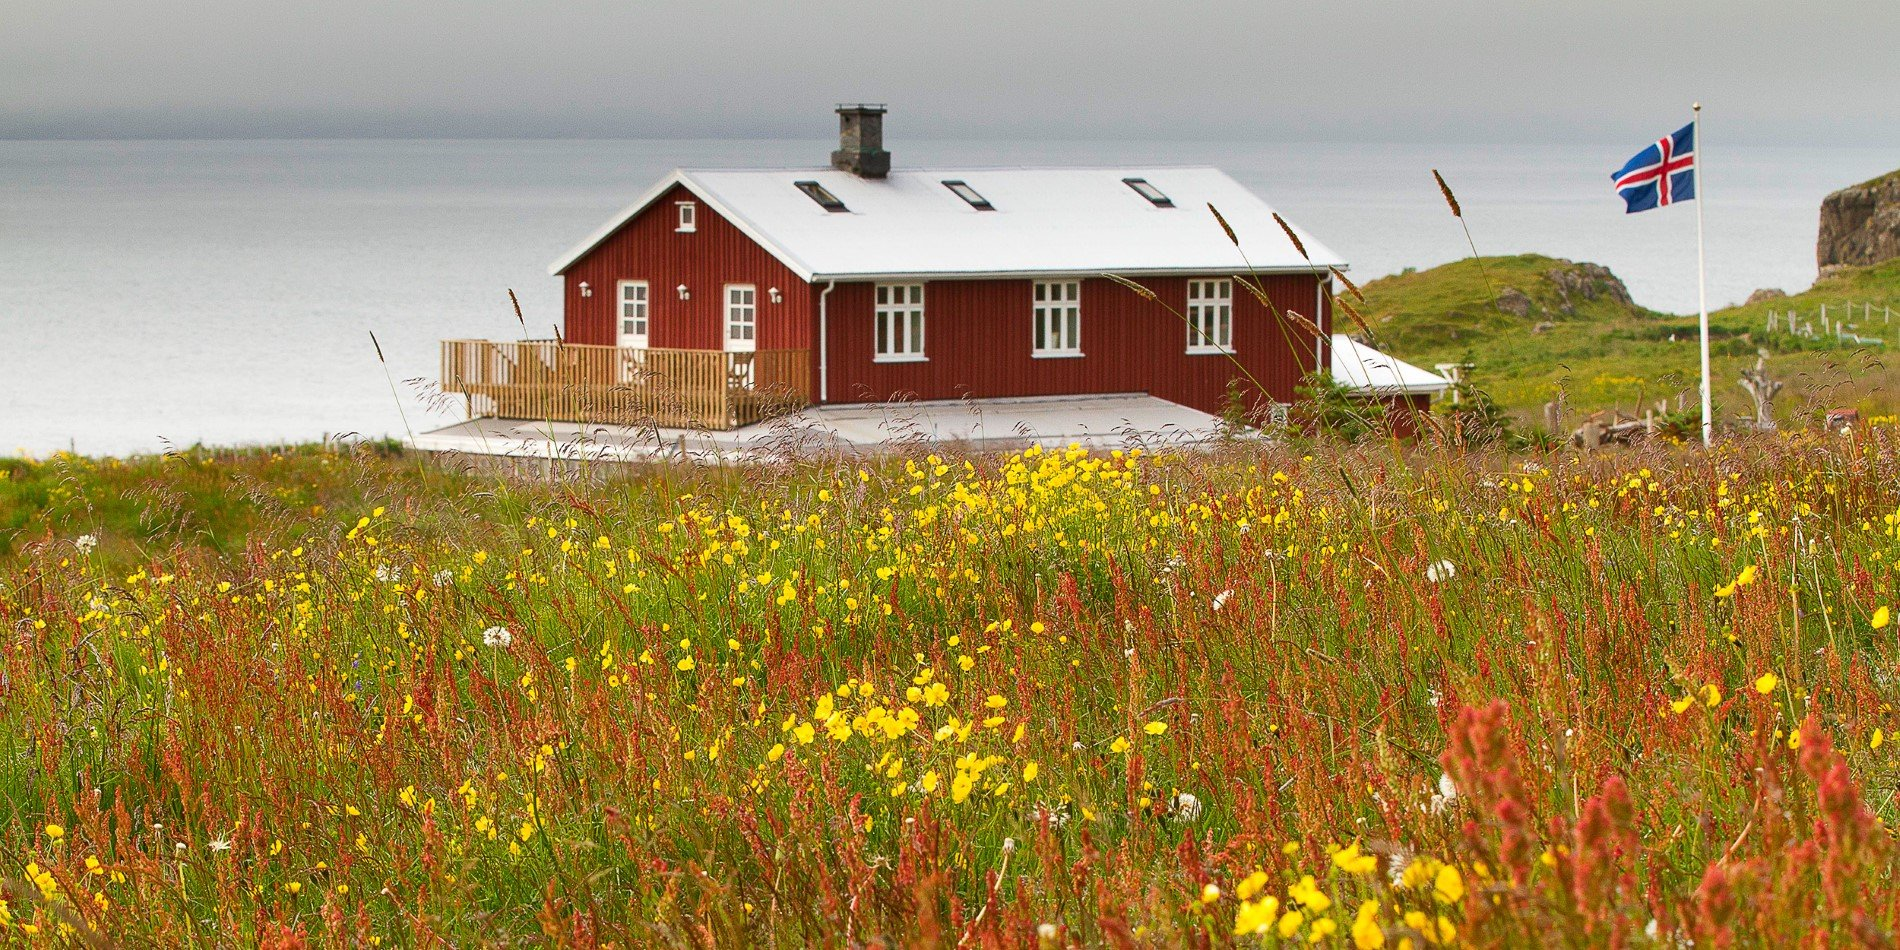 The sympathetically renovated Icelandic farmhouse of Skalanes